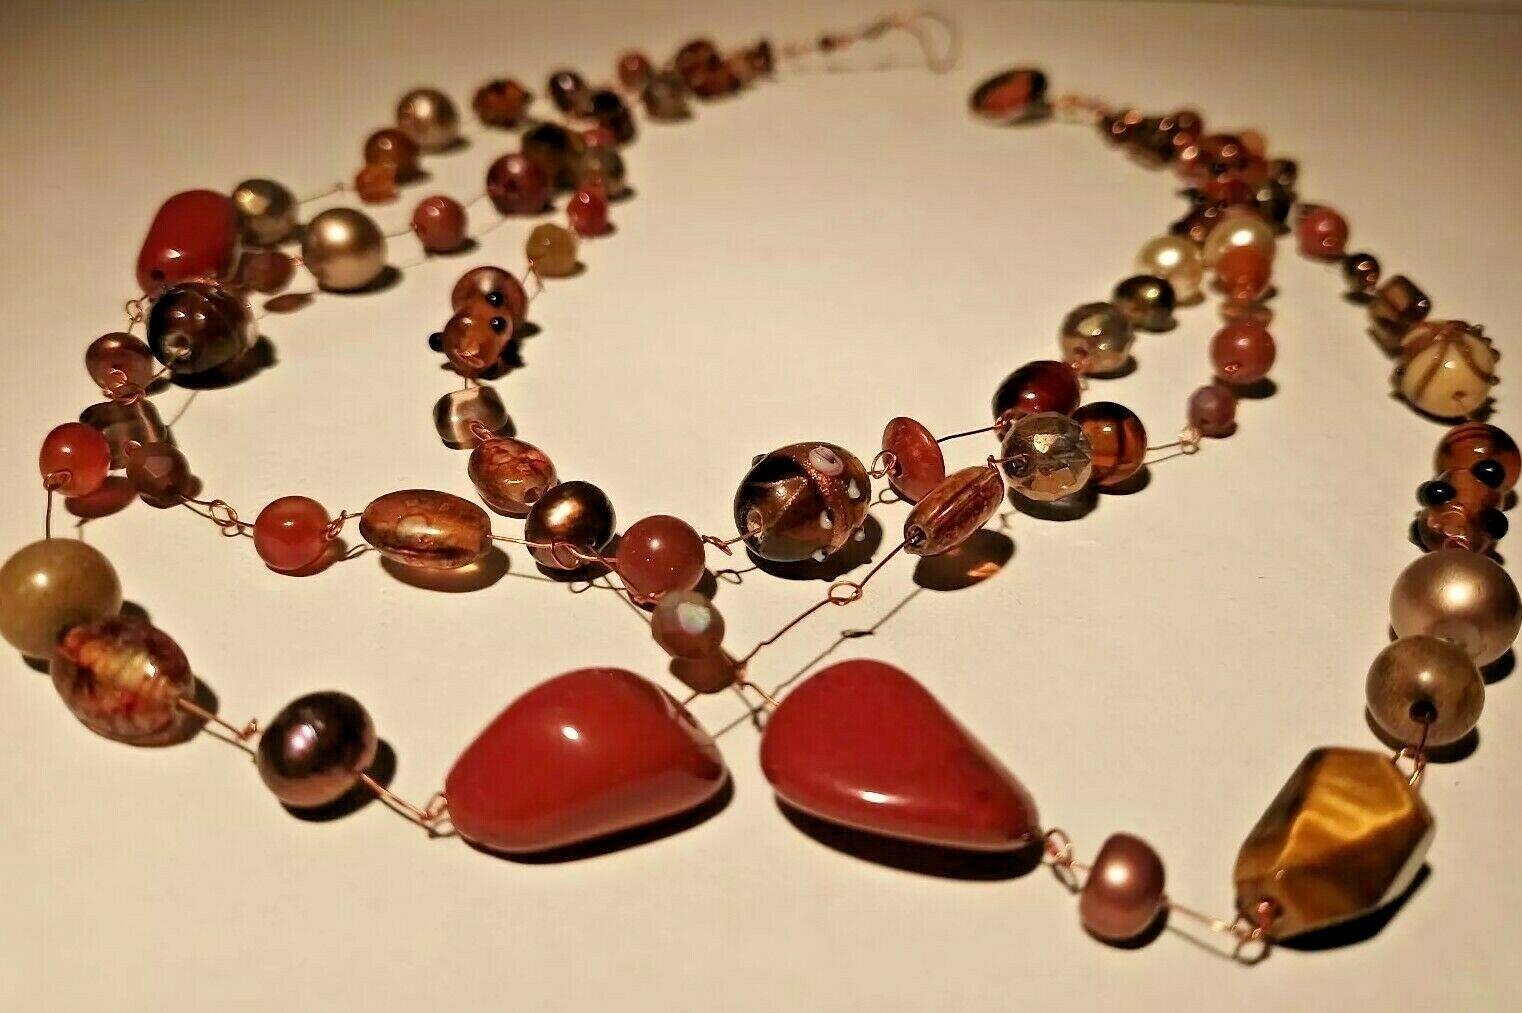 Unique 3 Strand Treasure Necklace w/ Pearls Stones Murano Glass and MUCH MORE! image 8